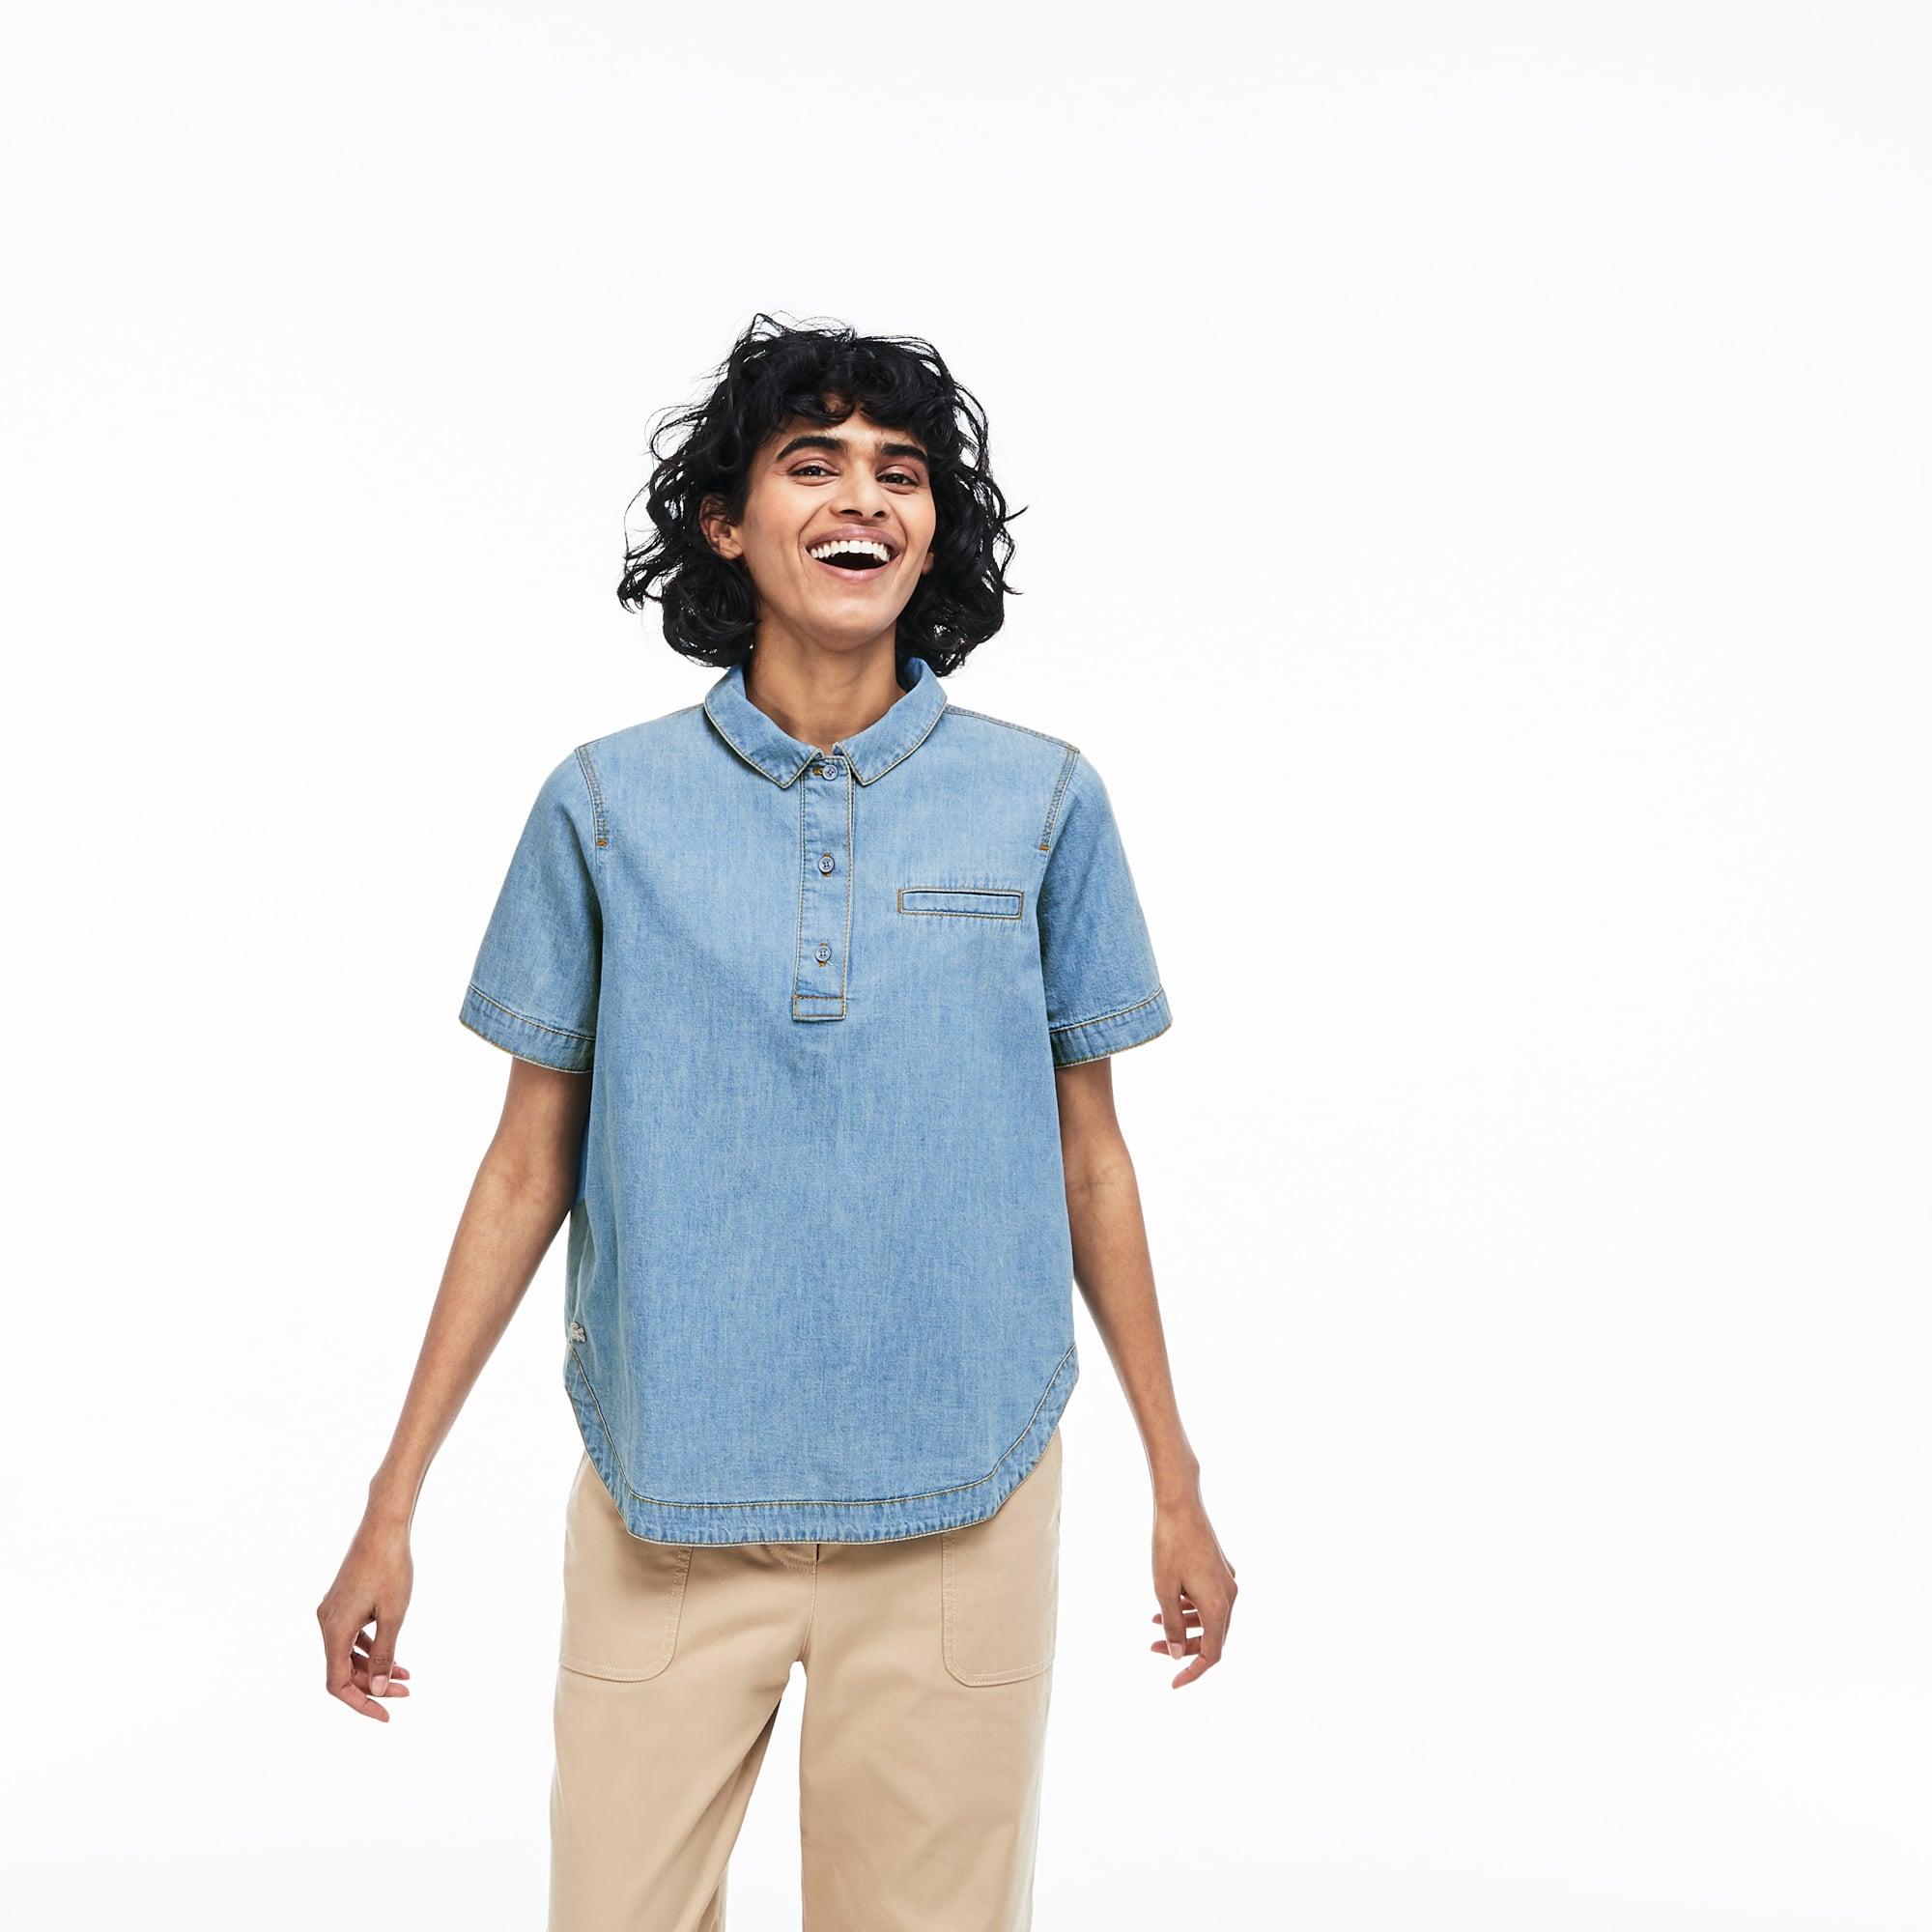 942cbf559b Chemises & Hauts | Vêtements Femme | LACOSTE